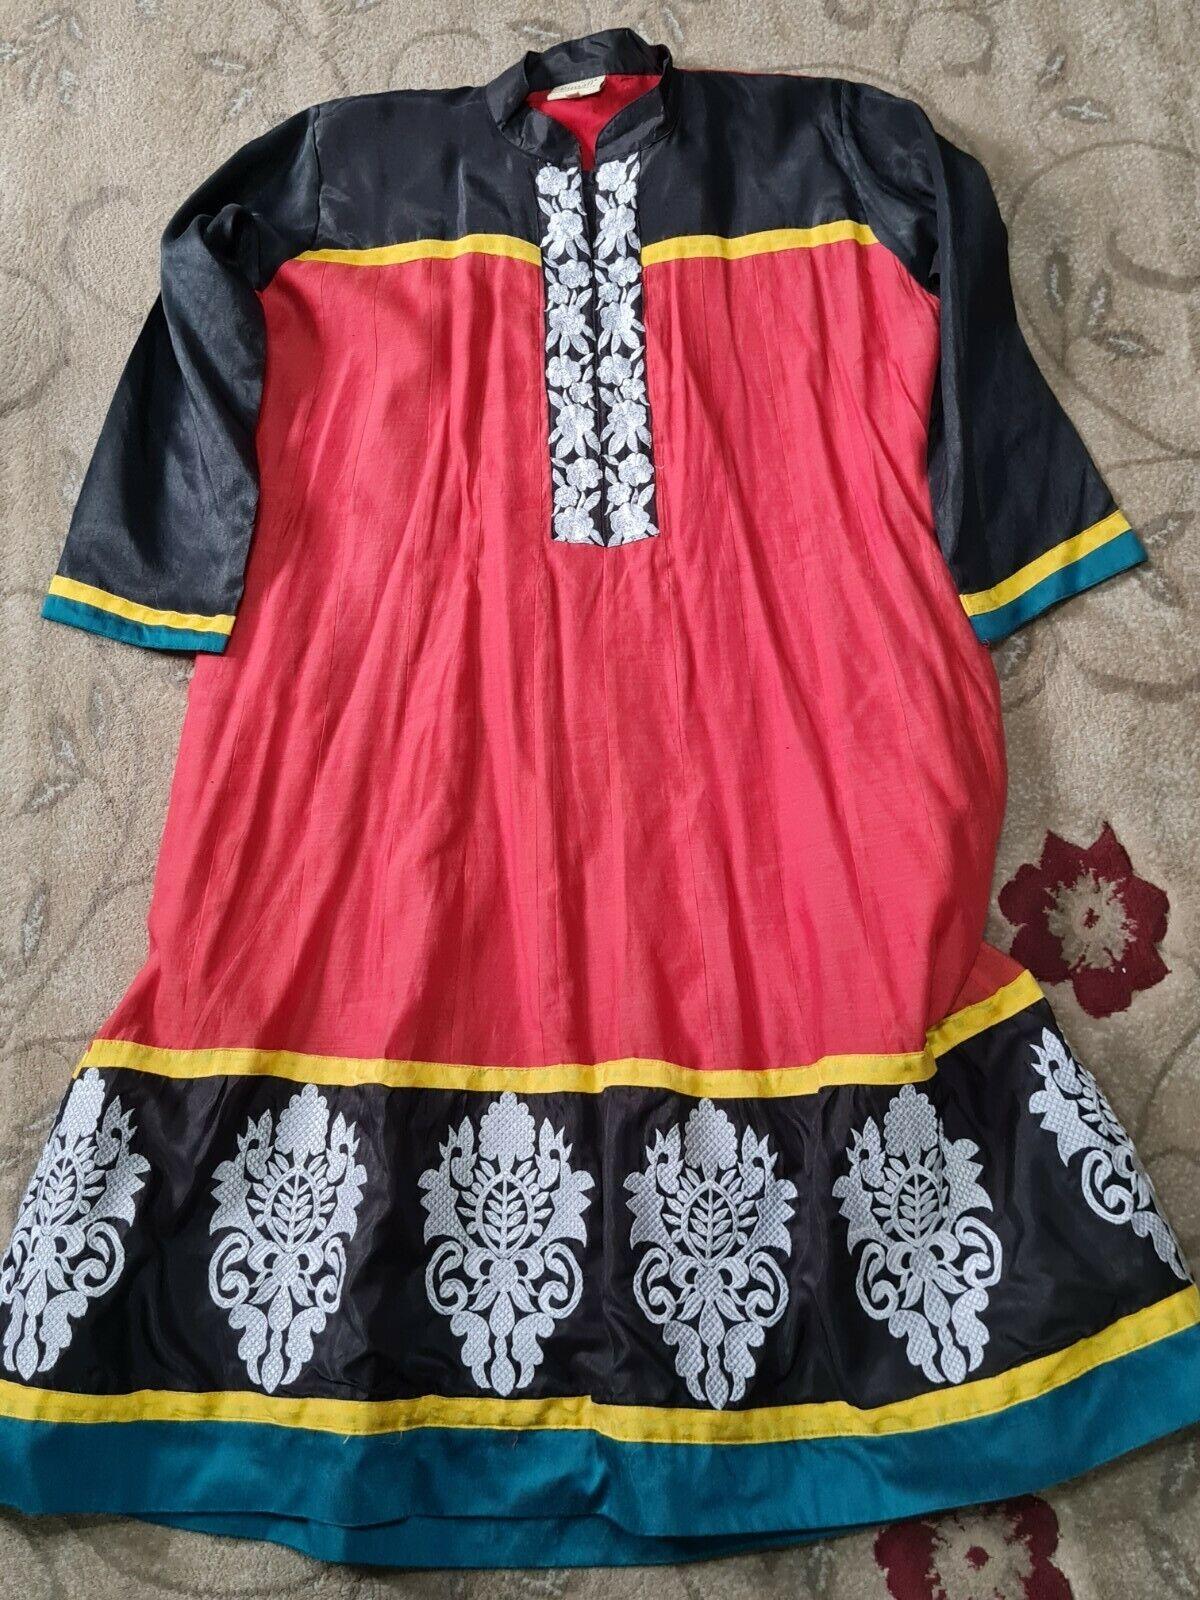 Salwar Kameez Anarkali dress - Rupali brand - red and black colour- XXL size